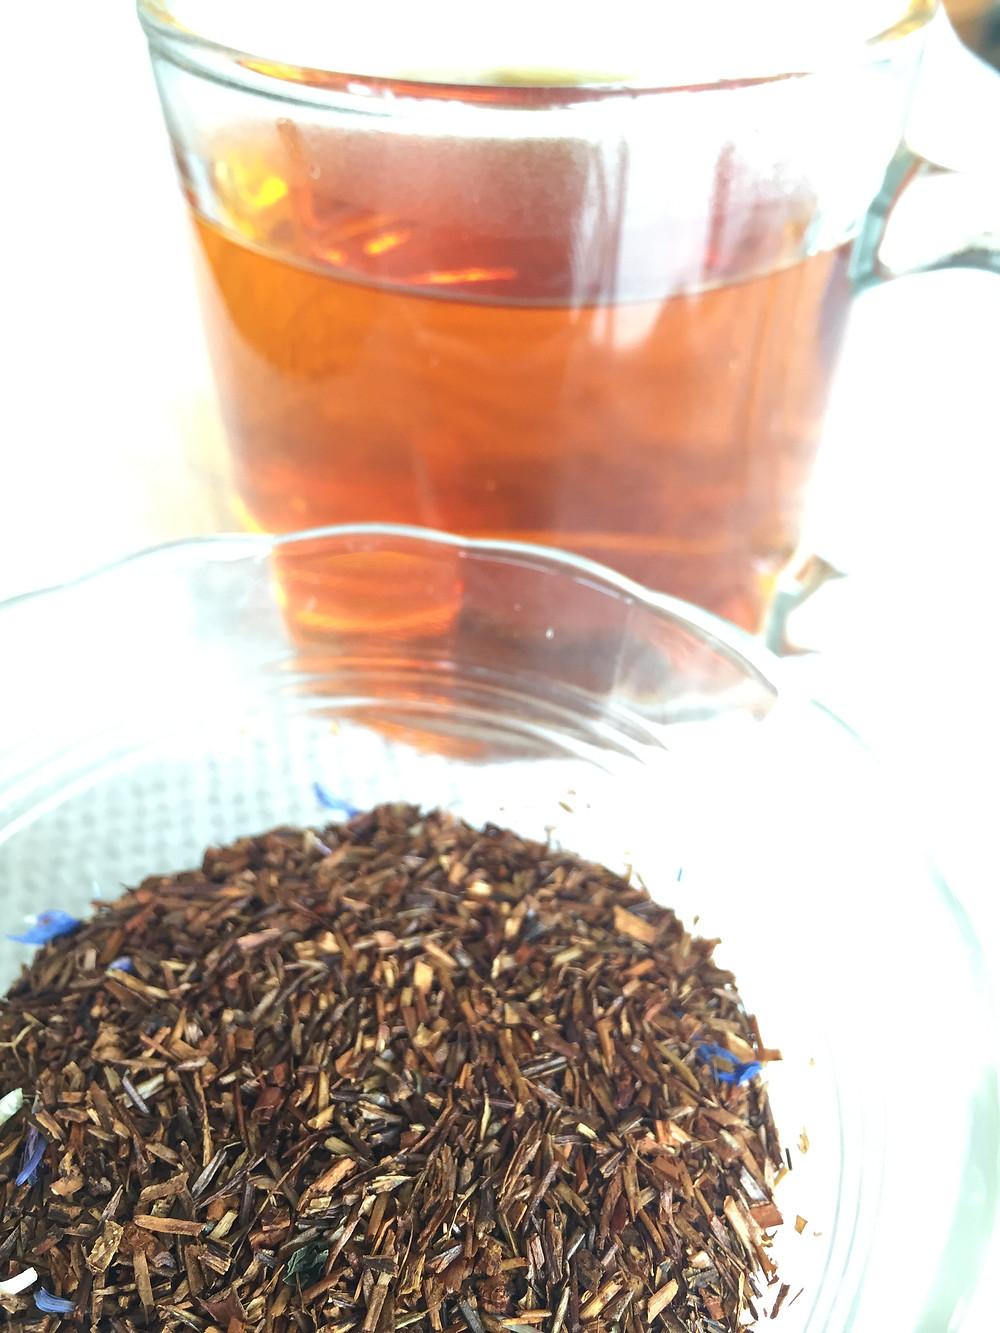 Rooibos tea leaves and cup of tea